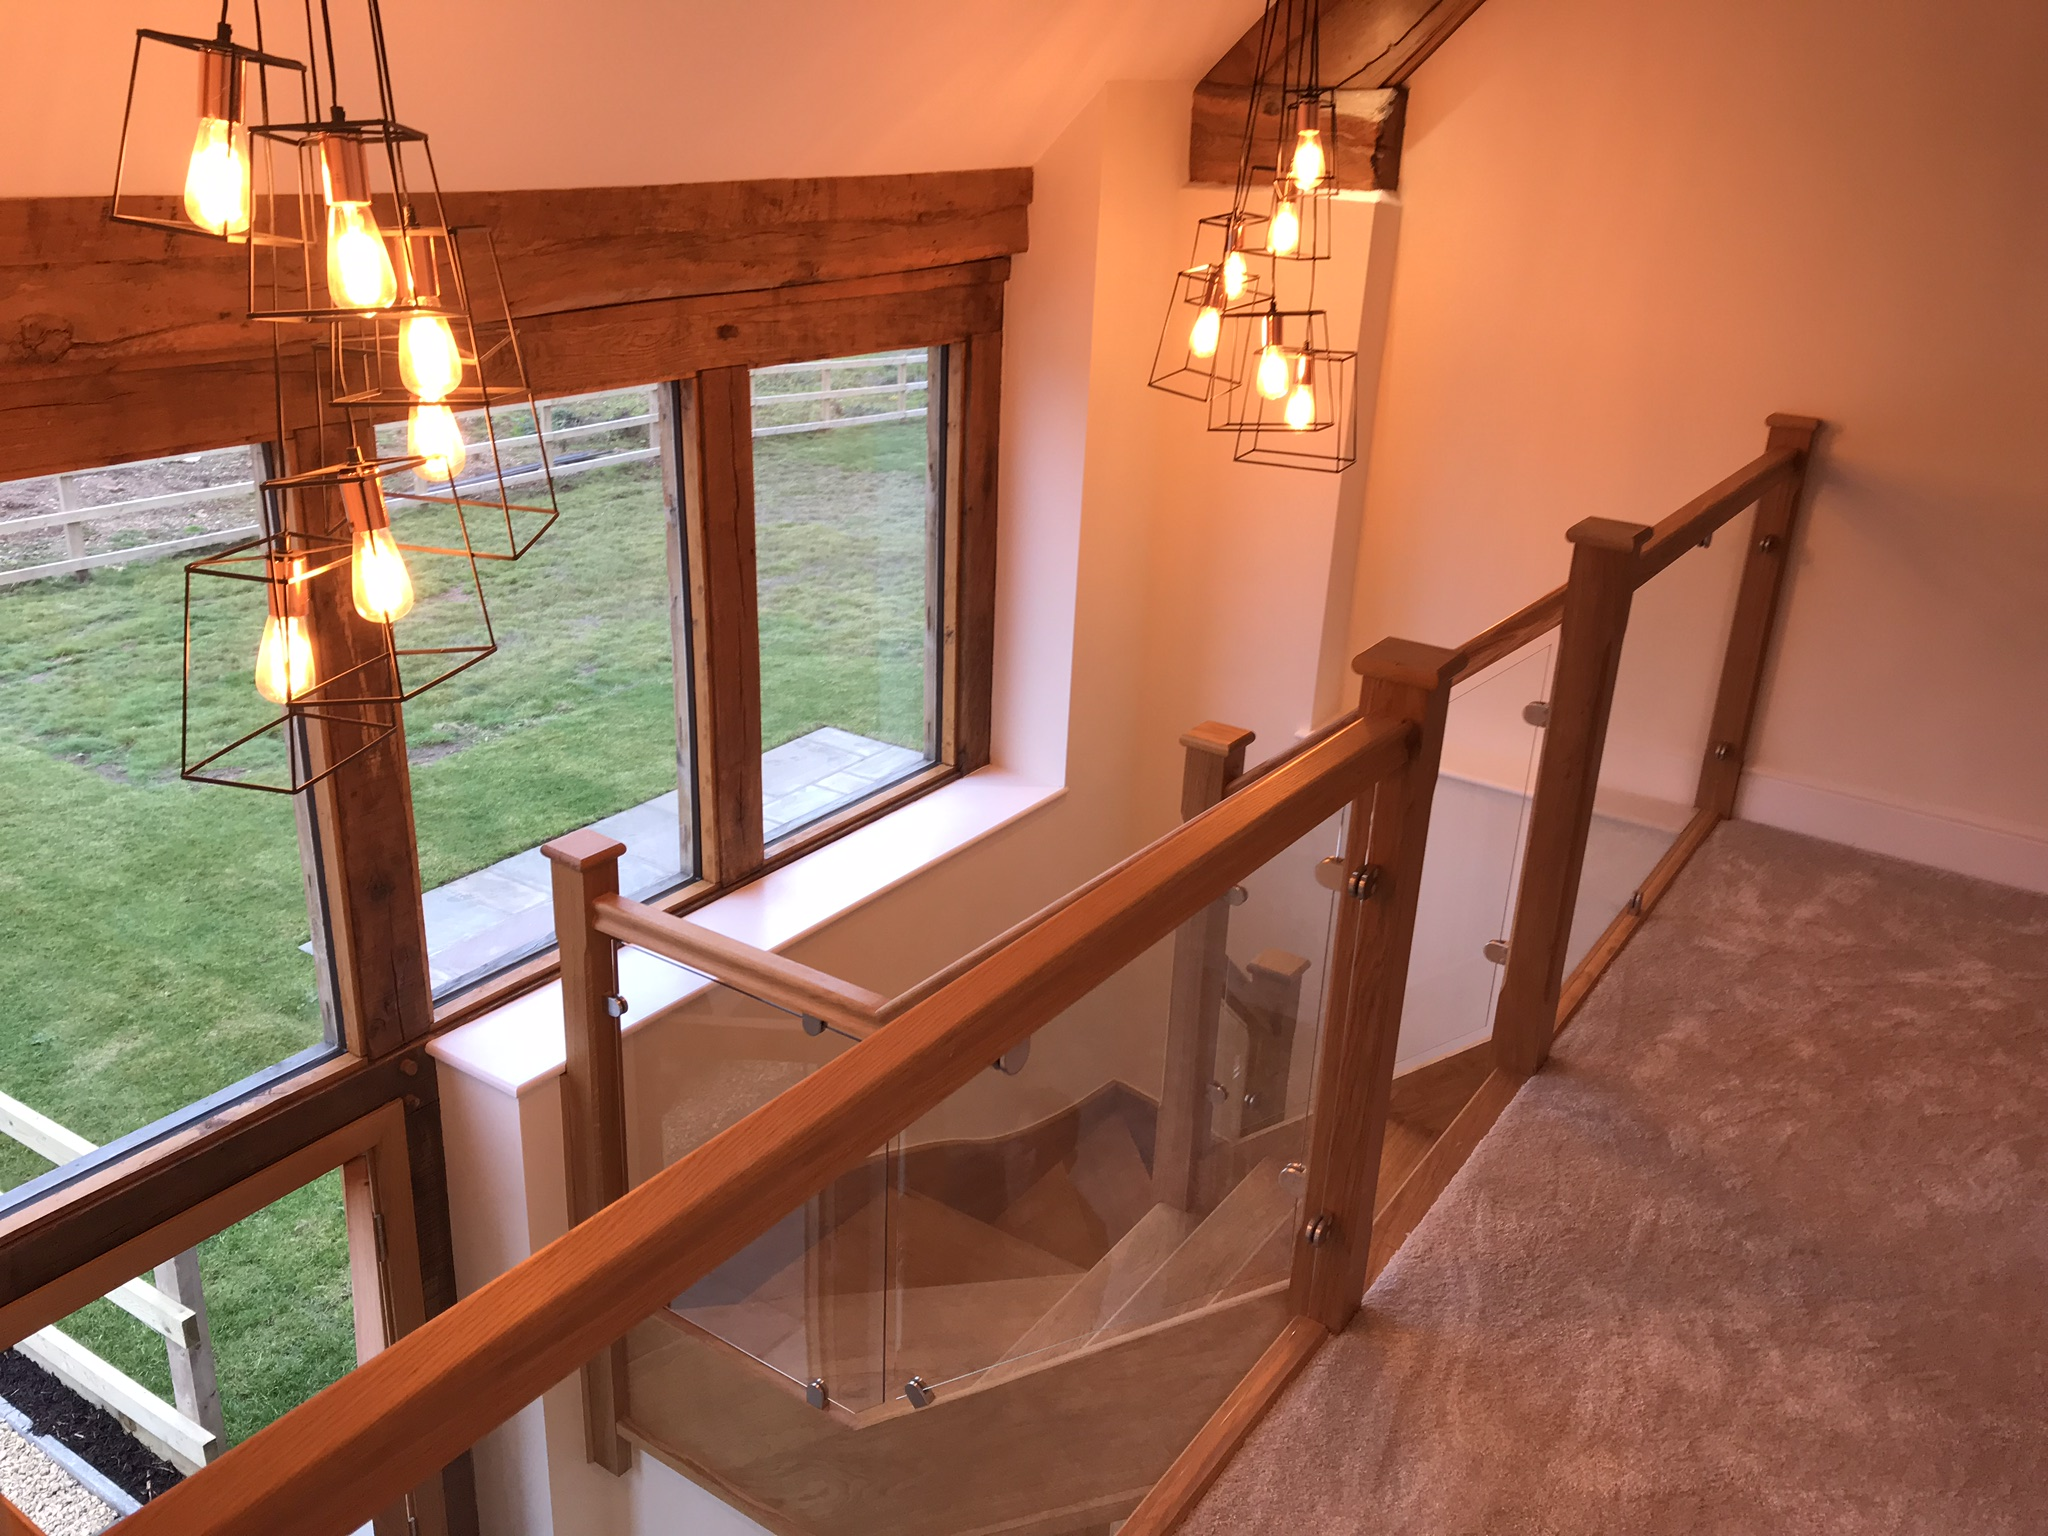 oak stairs b3 flemming (4)